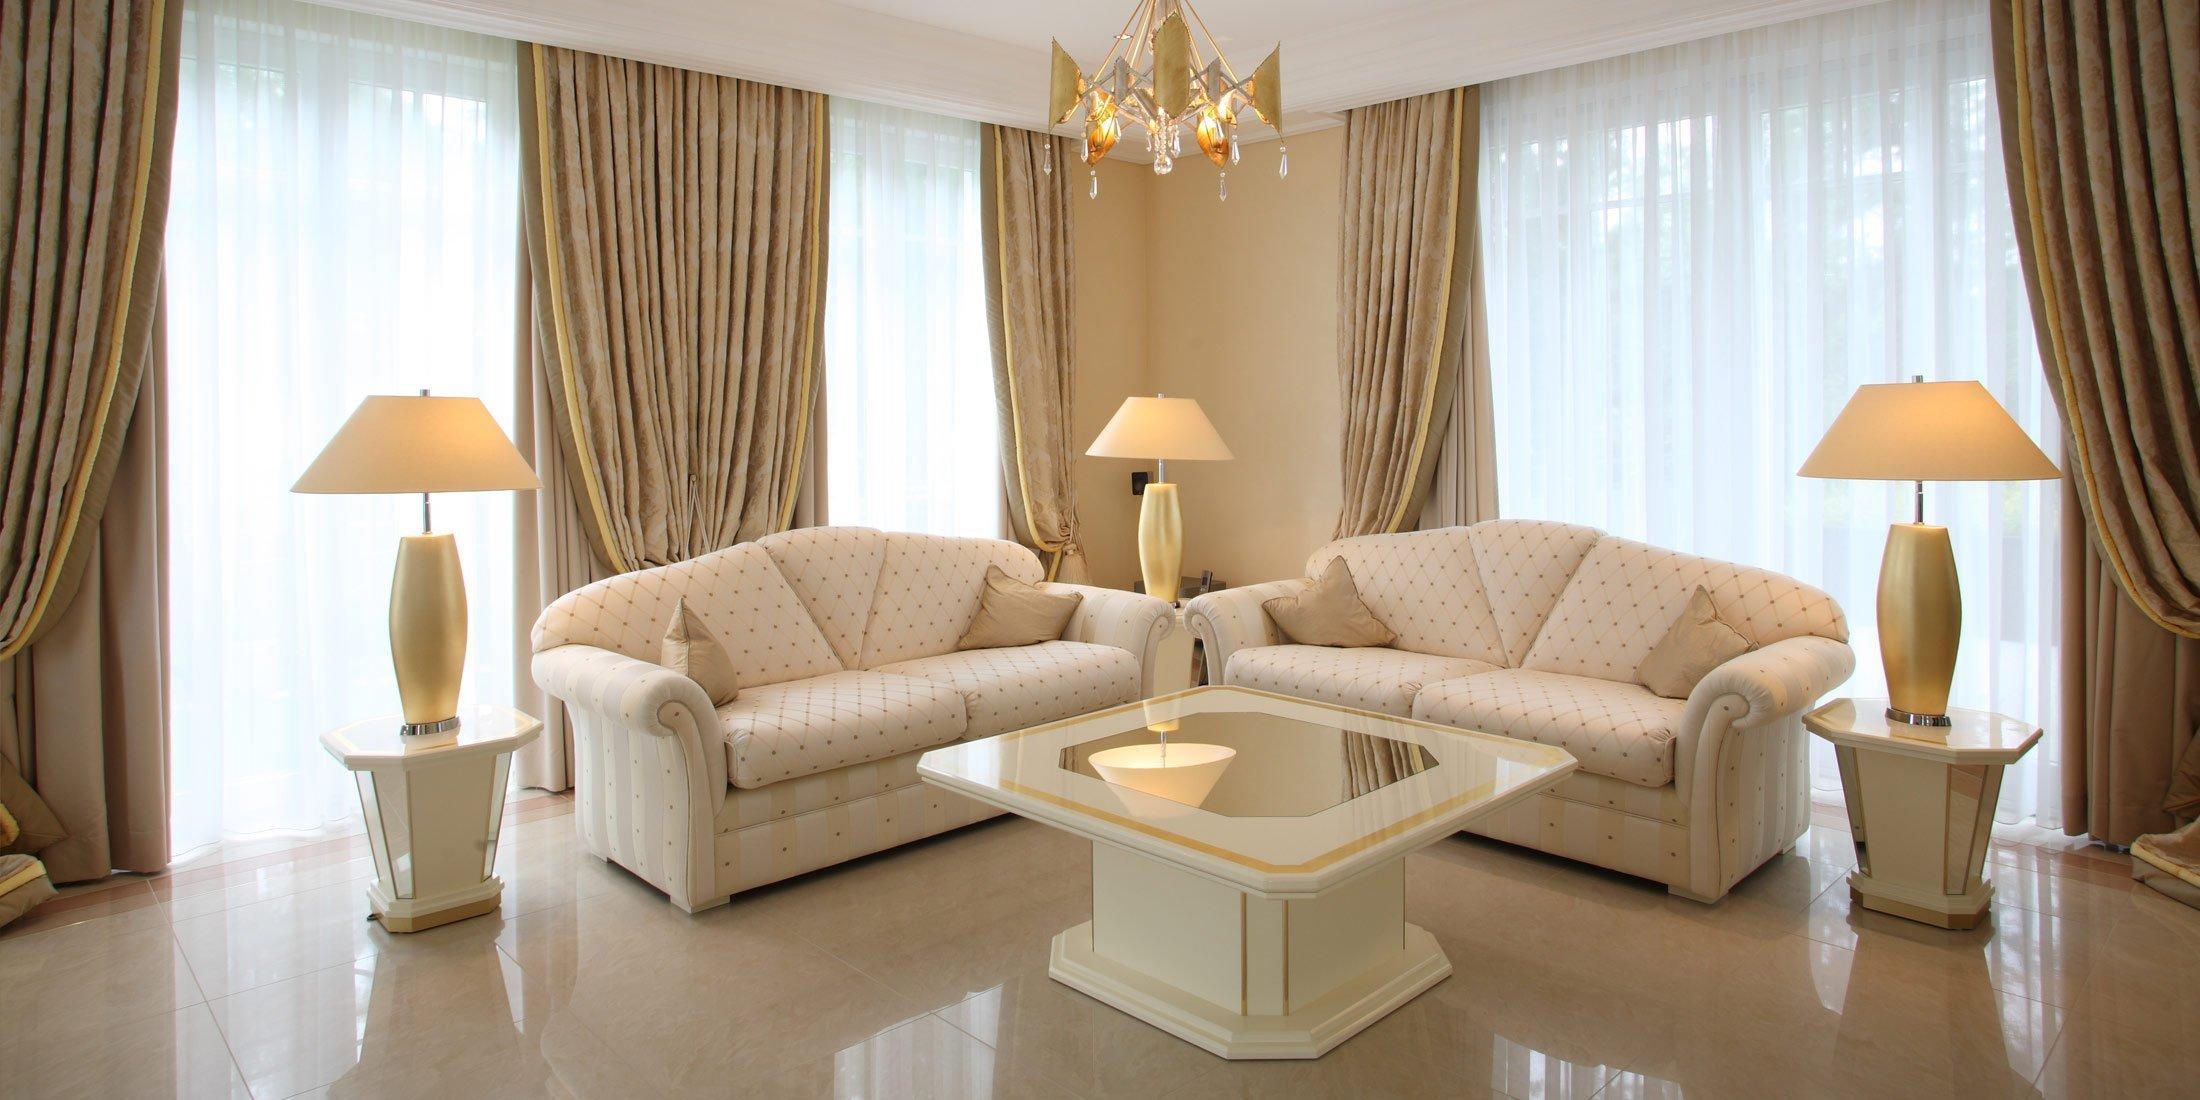 design boerse berlin photo source itb berlin deutsche. Black Bedroom Furniture Sets. Home Design Ideas